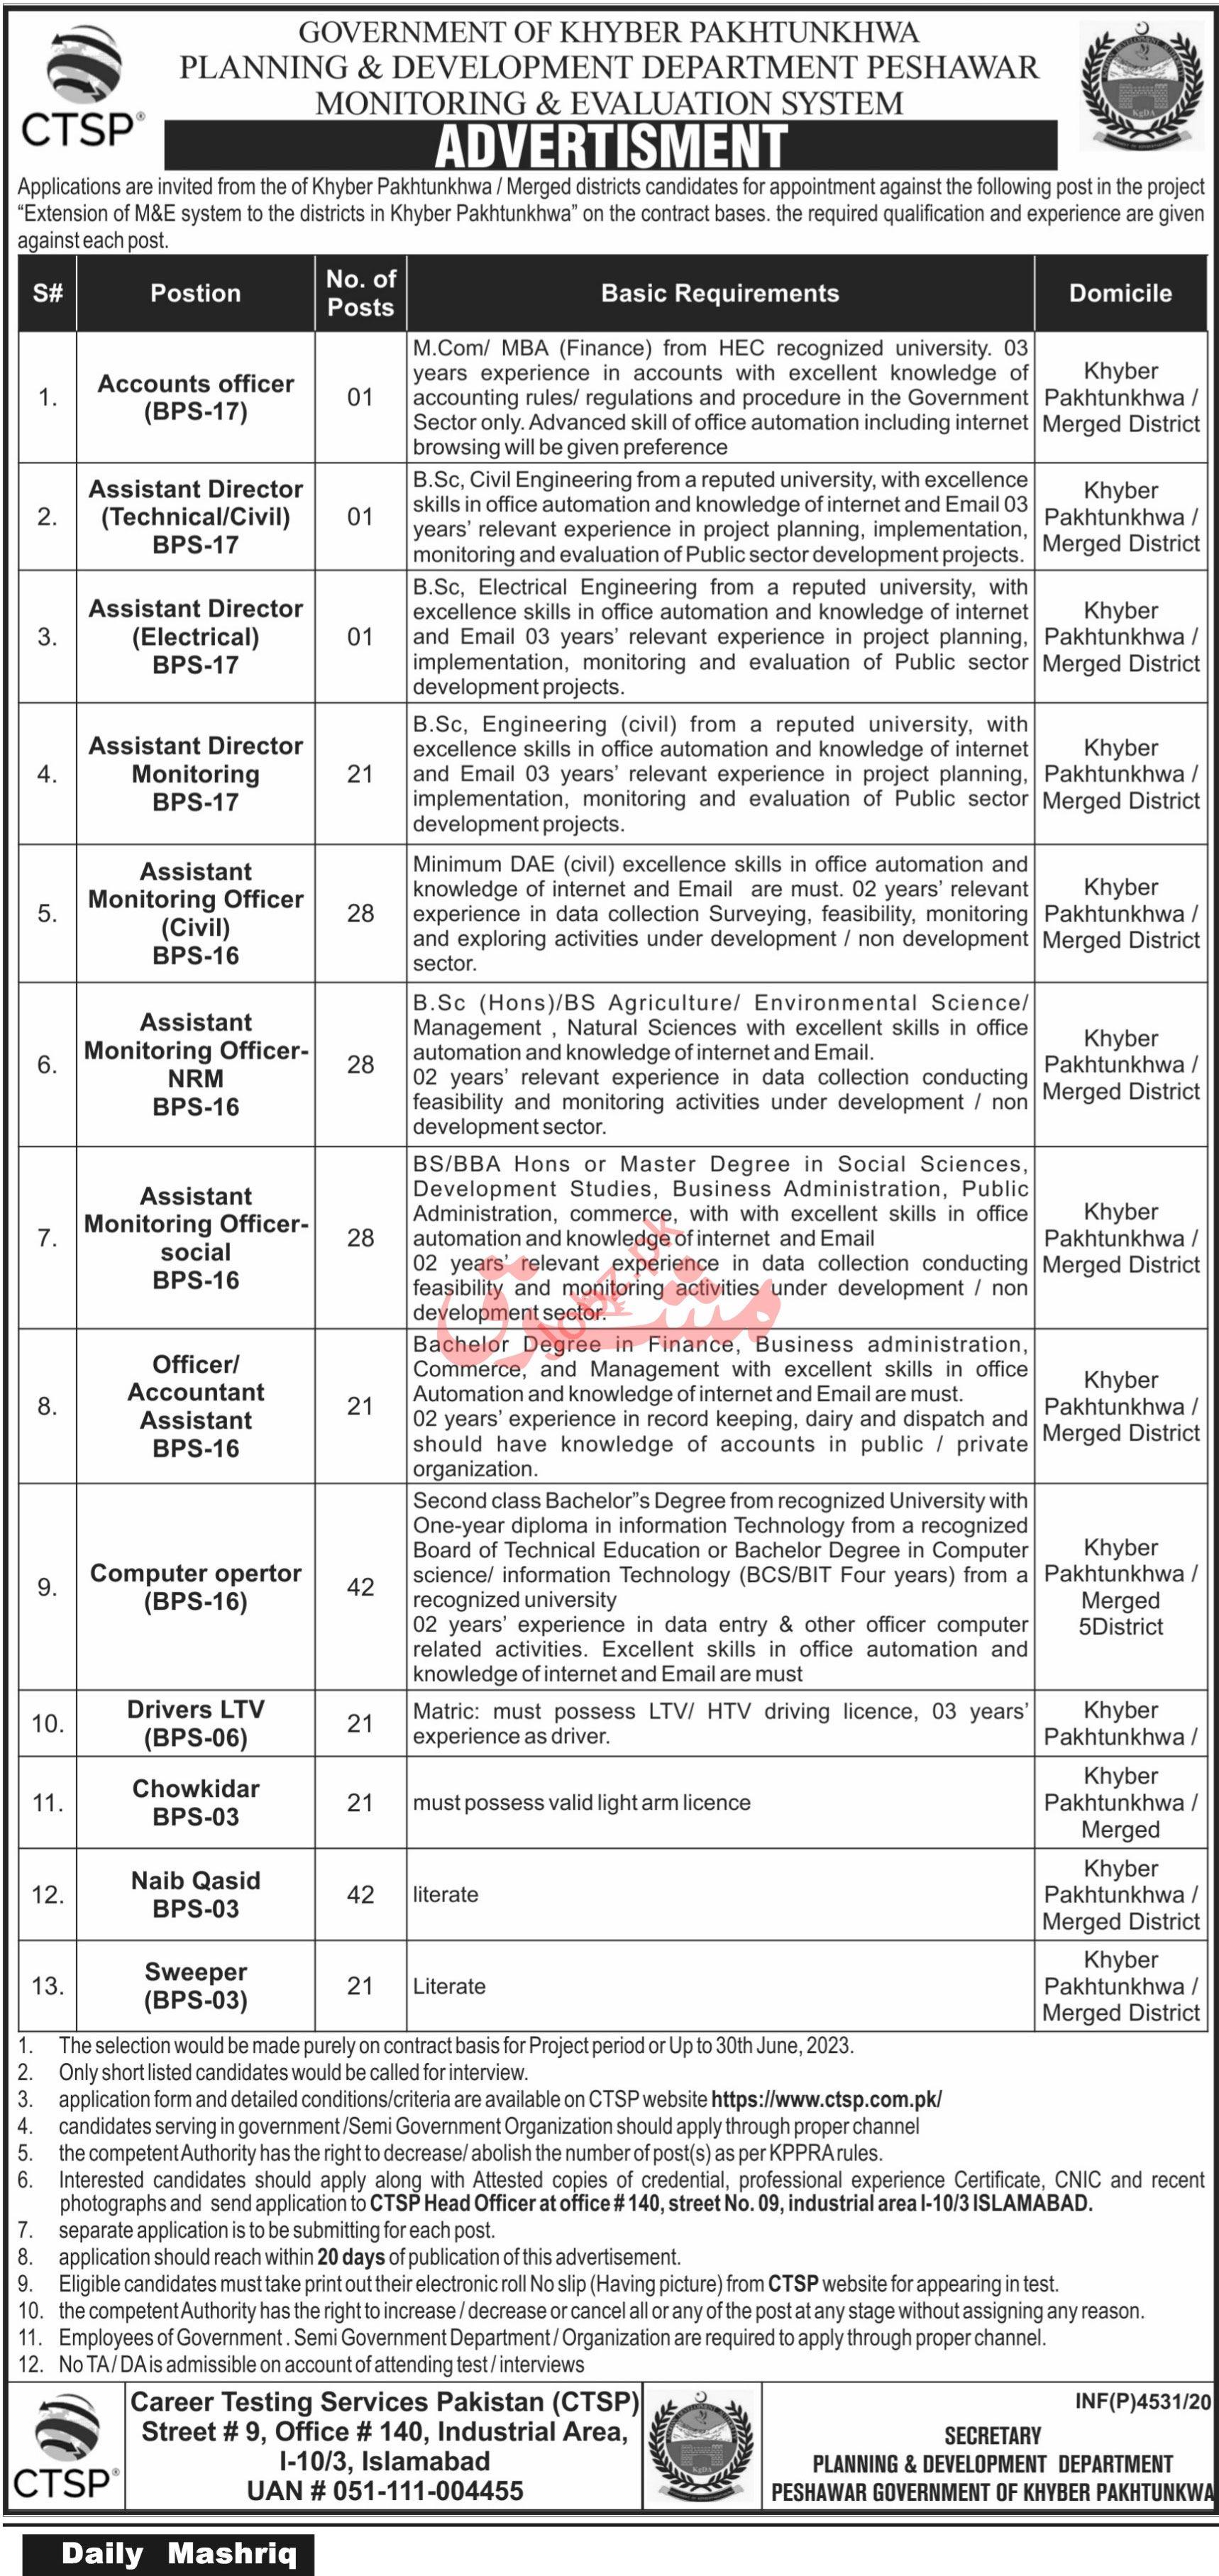 Peshawar Monitoring & Evaluation System P&D KPK Jobs 2020